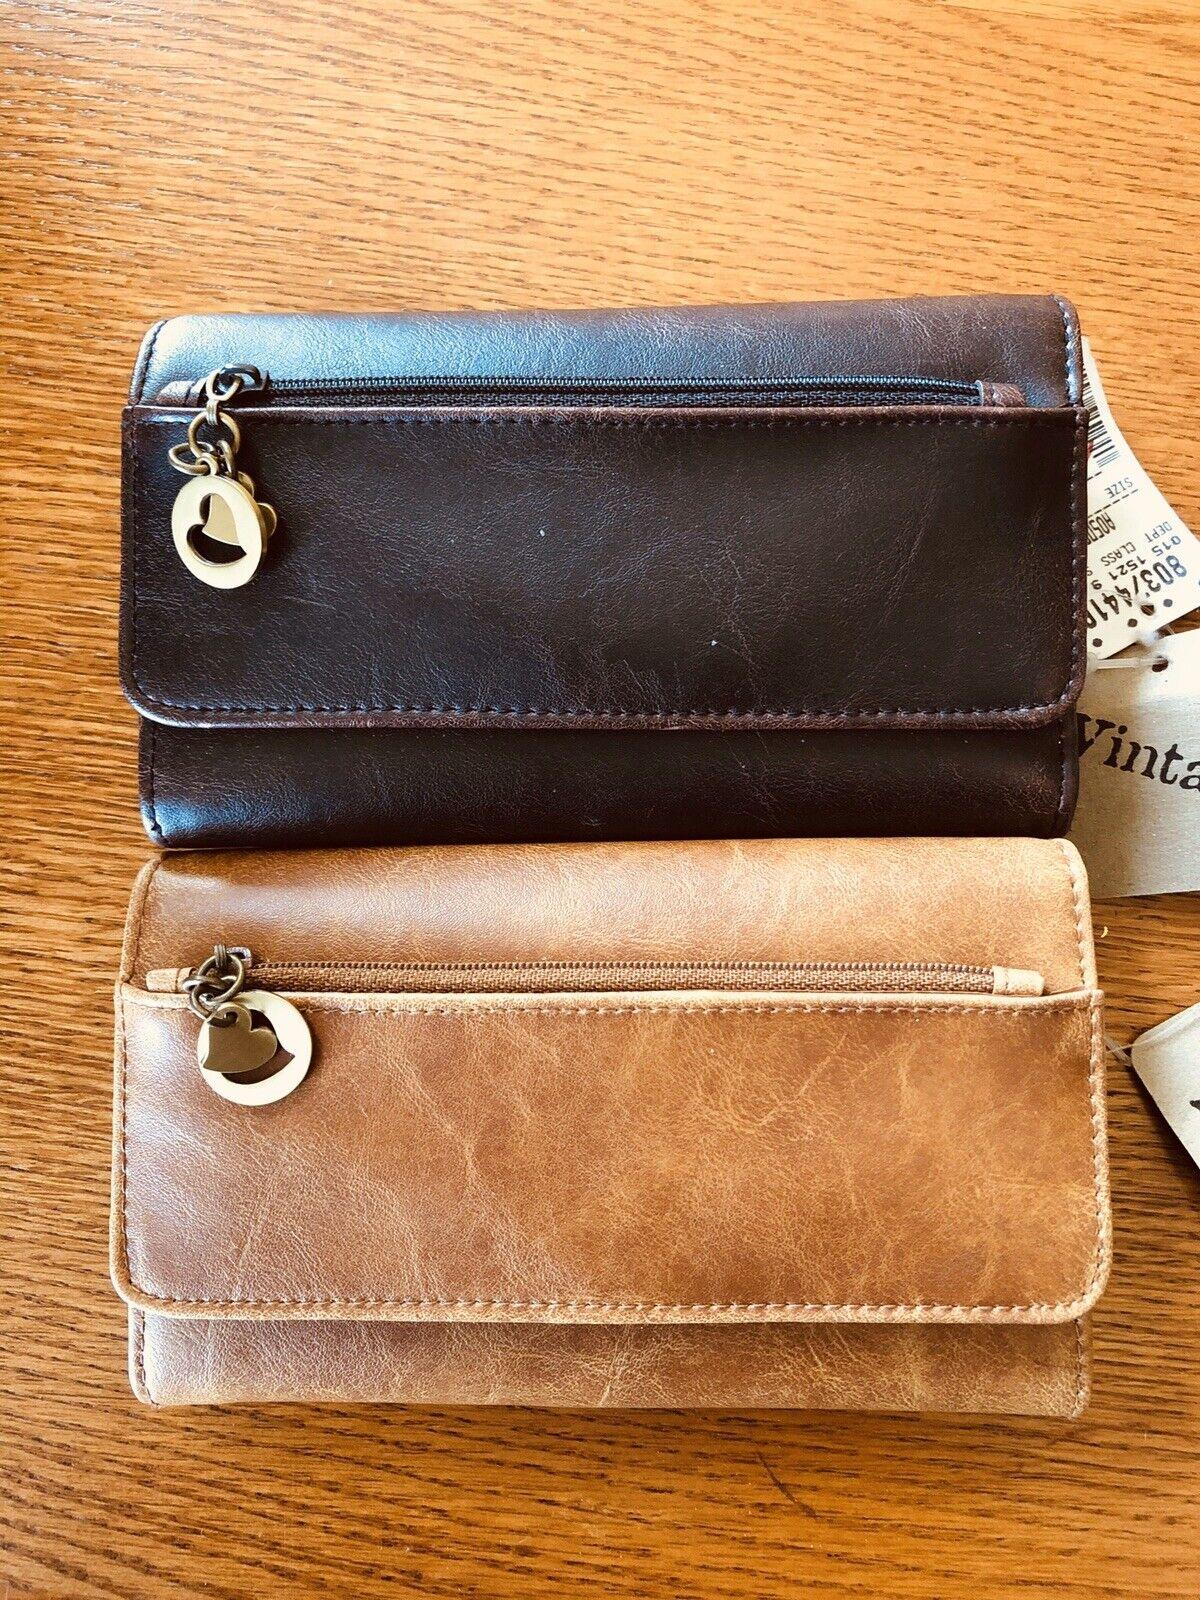 2 Vintage Brand Leather Wallets One Light Brown & One Dark Brown